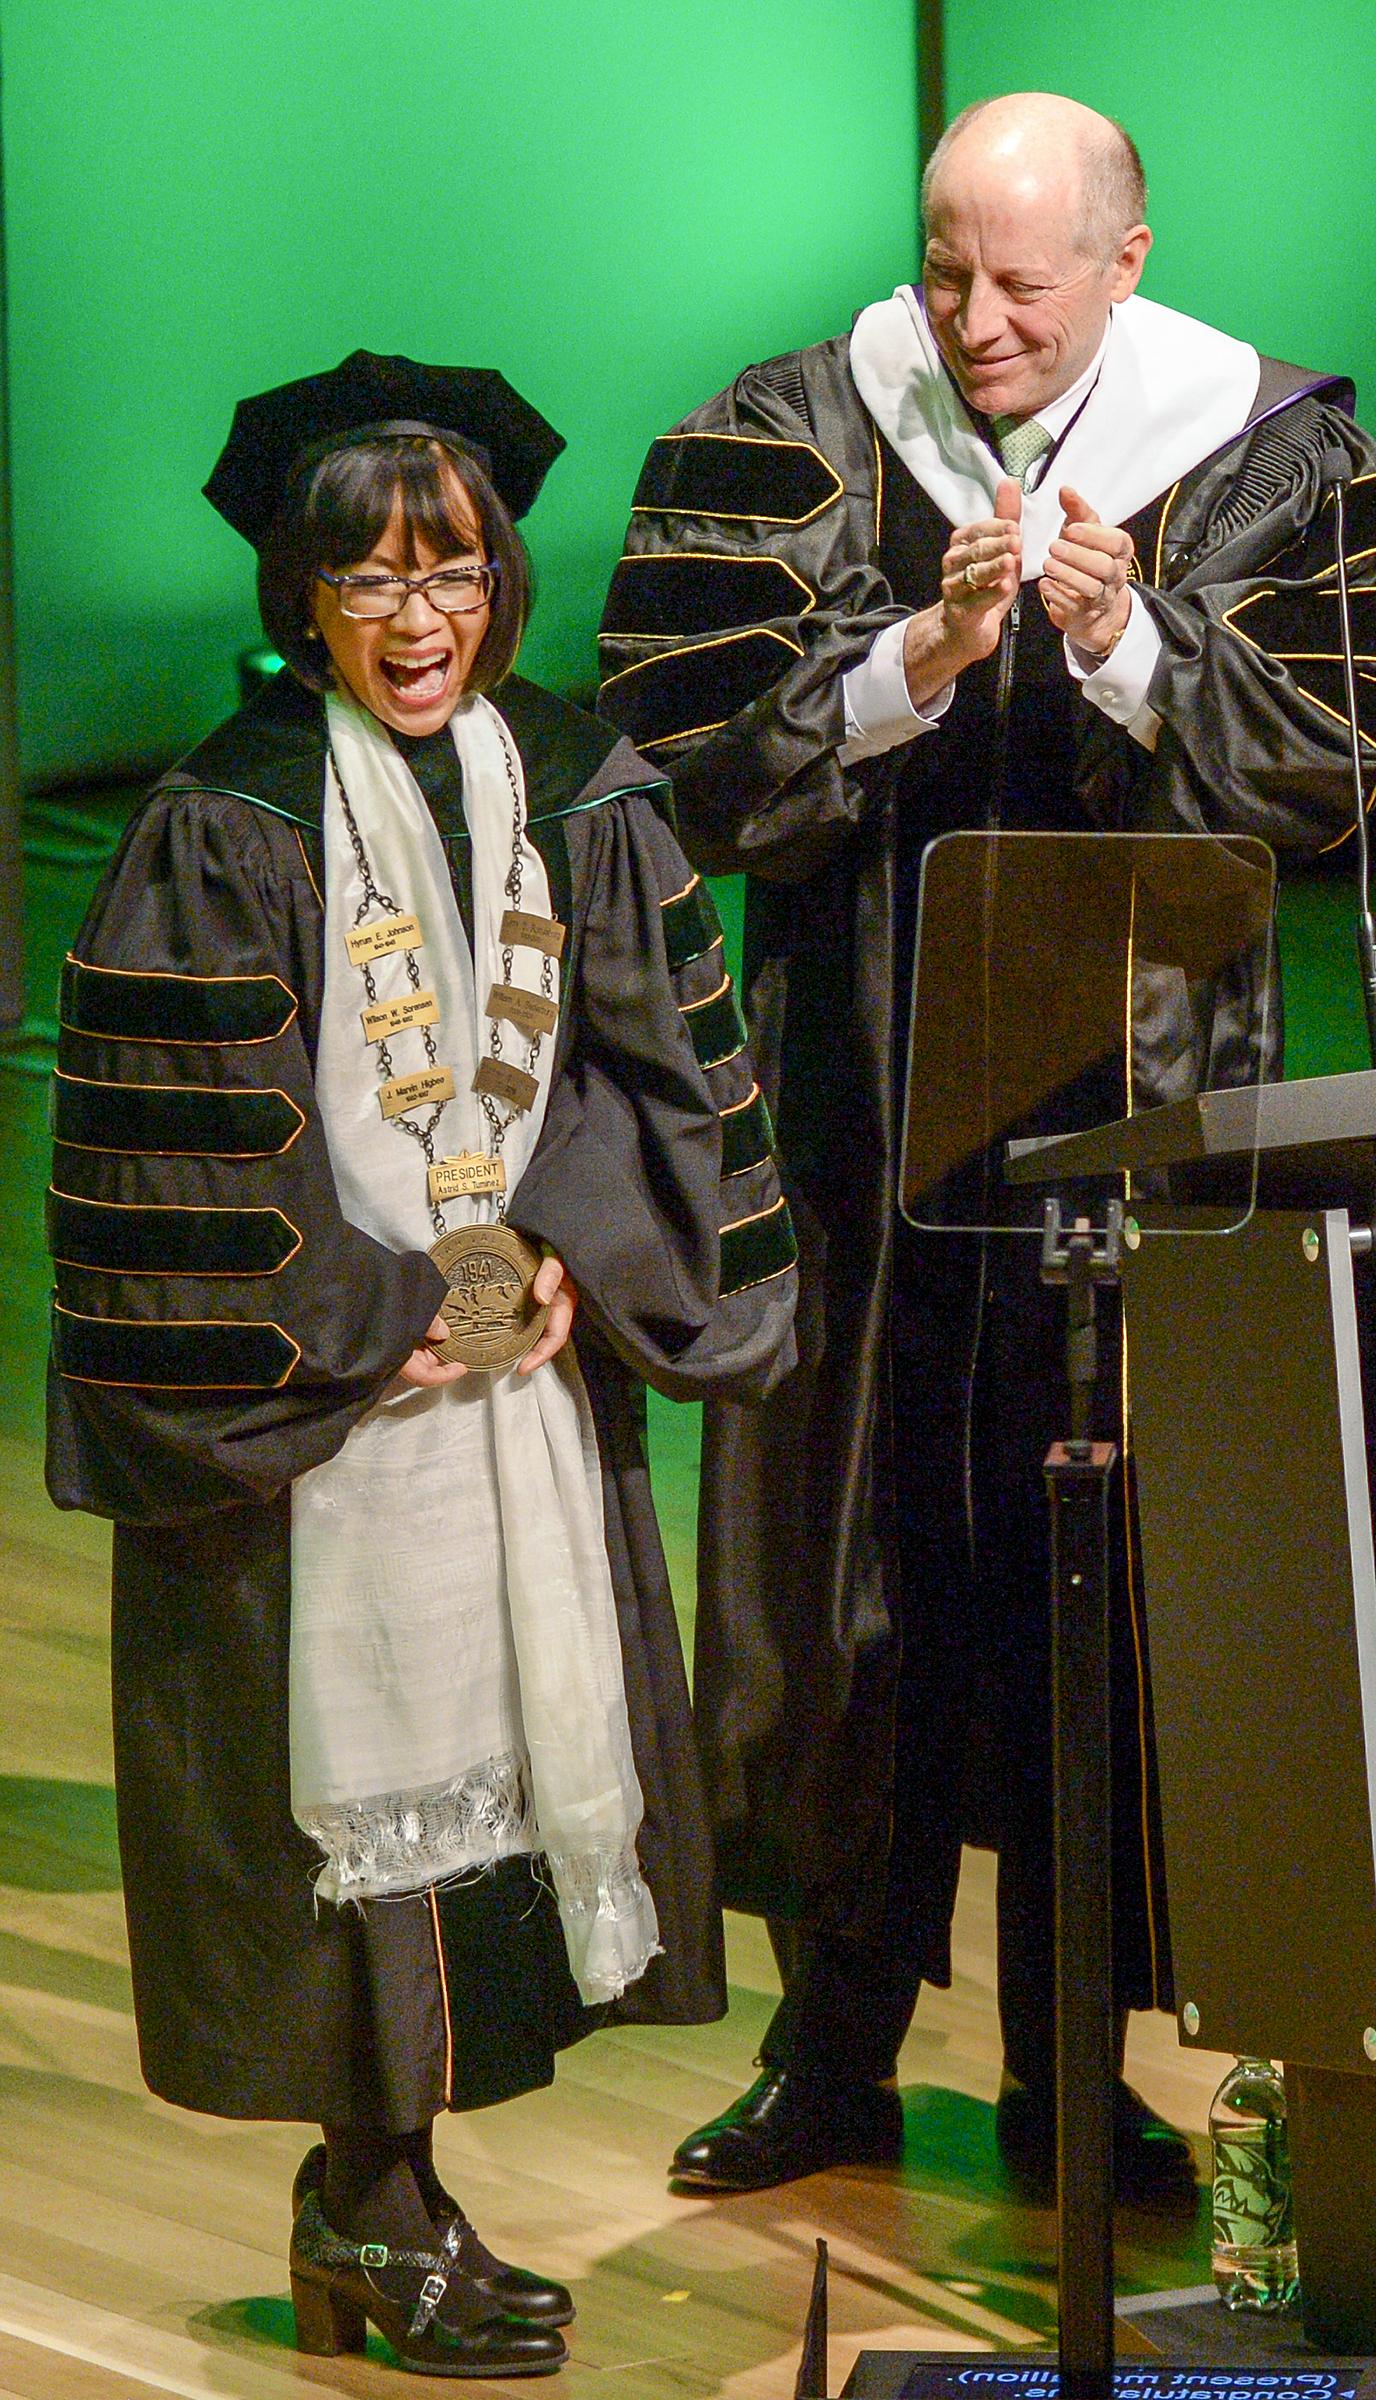 Utah Valley University inaugurates its first female president